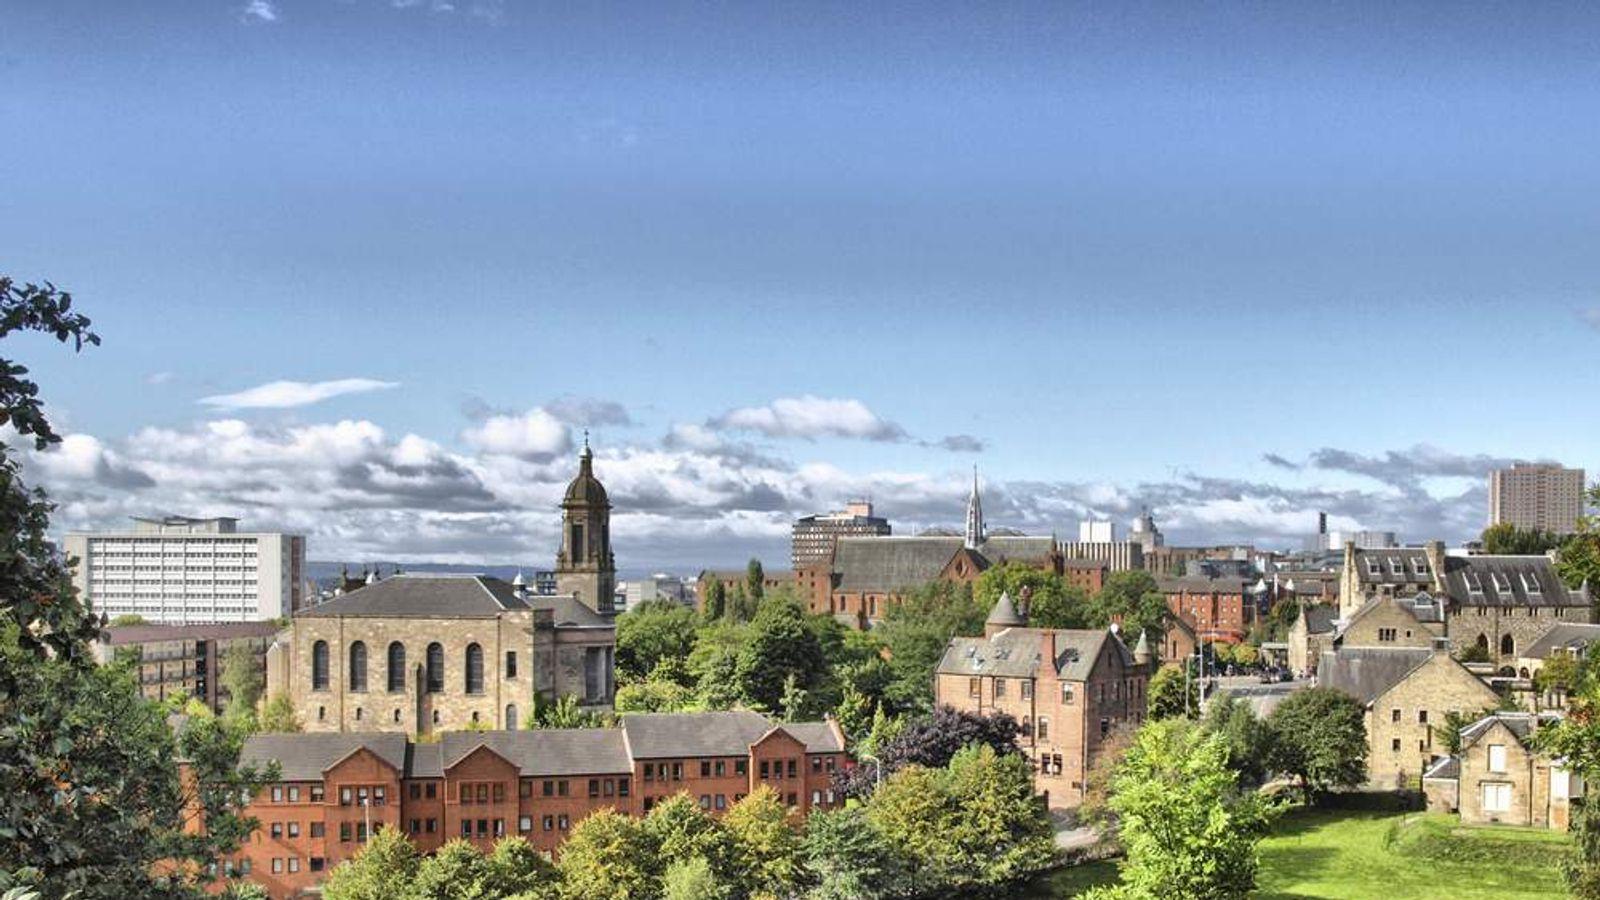 The Scottish city of Glasgow